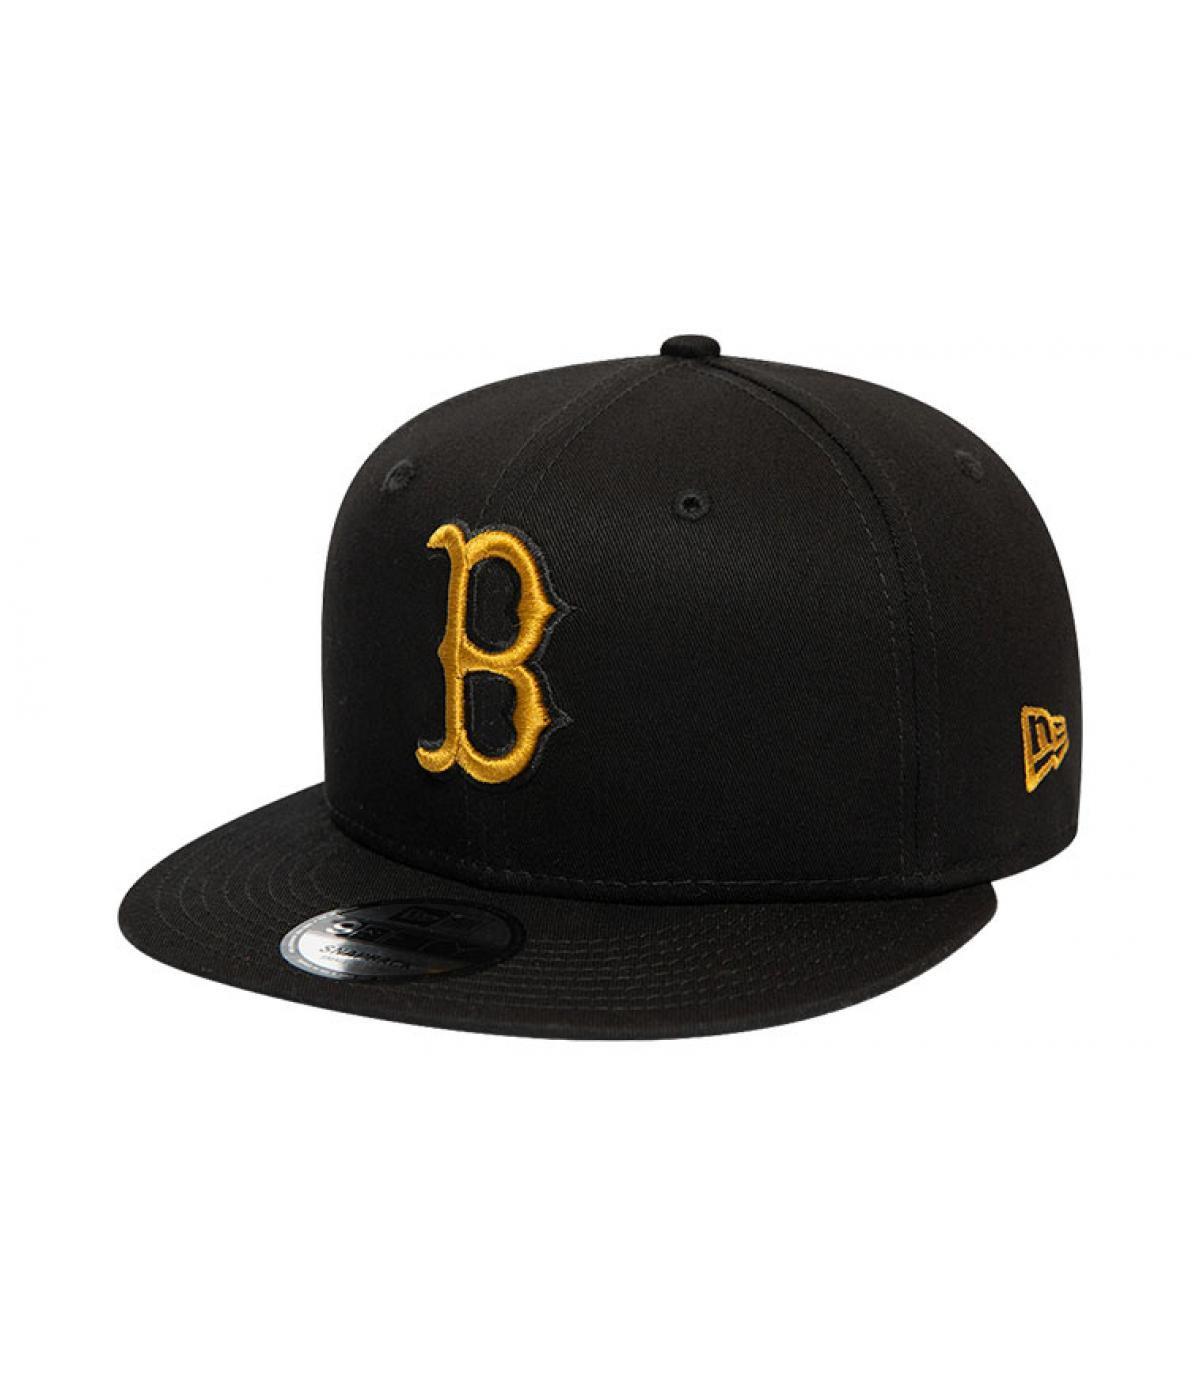 Details Snapback League Ess Boston 950 black gold - afbeeling 2